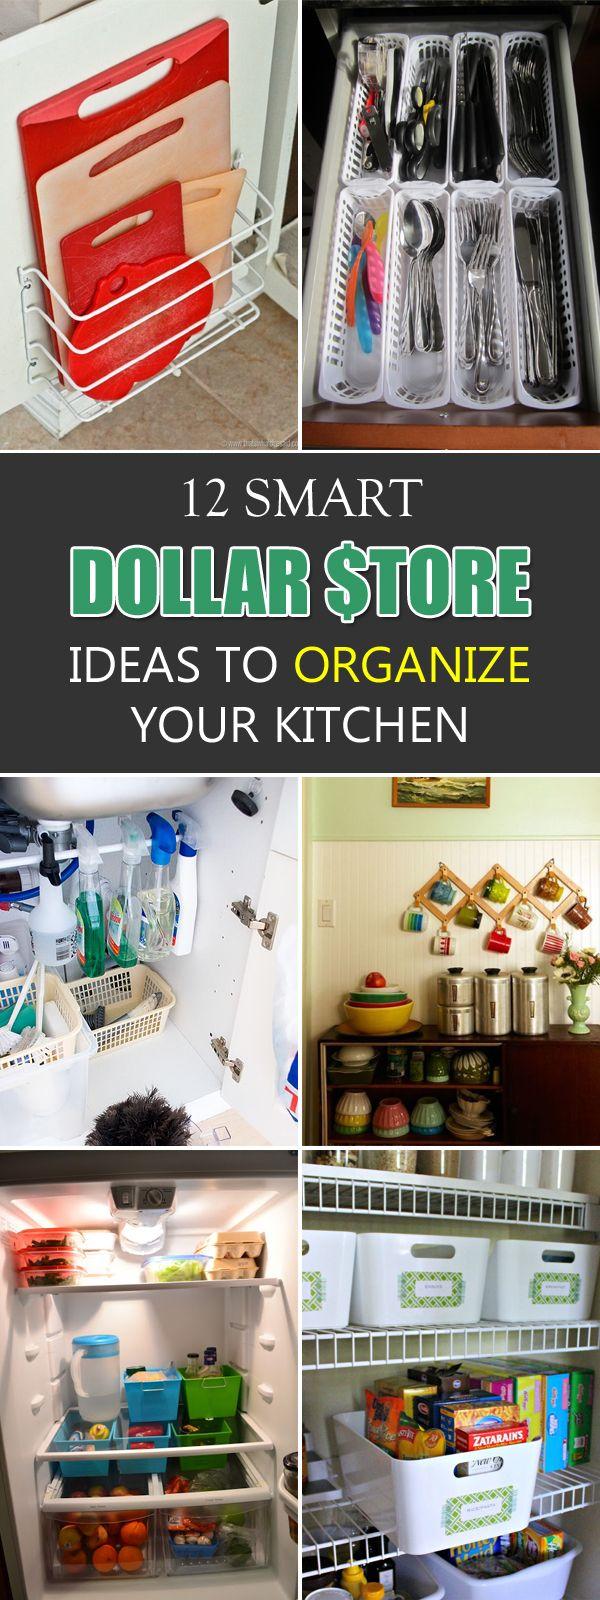 12 Creative And Smart Kitchen Organization Ideas Smart: 12 Smart Dollar Store Ideas To Organize Your Kitchen